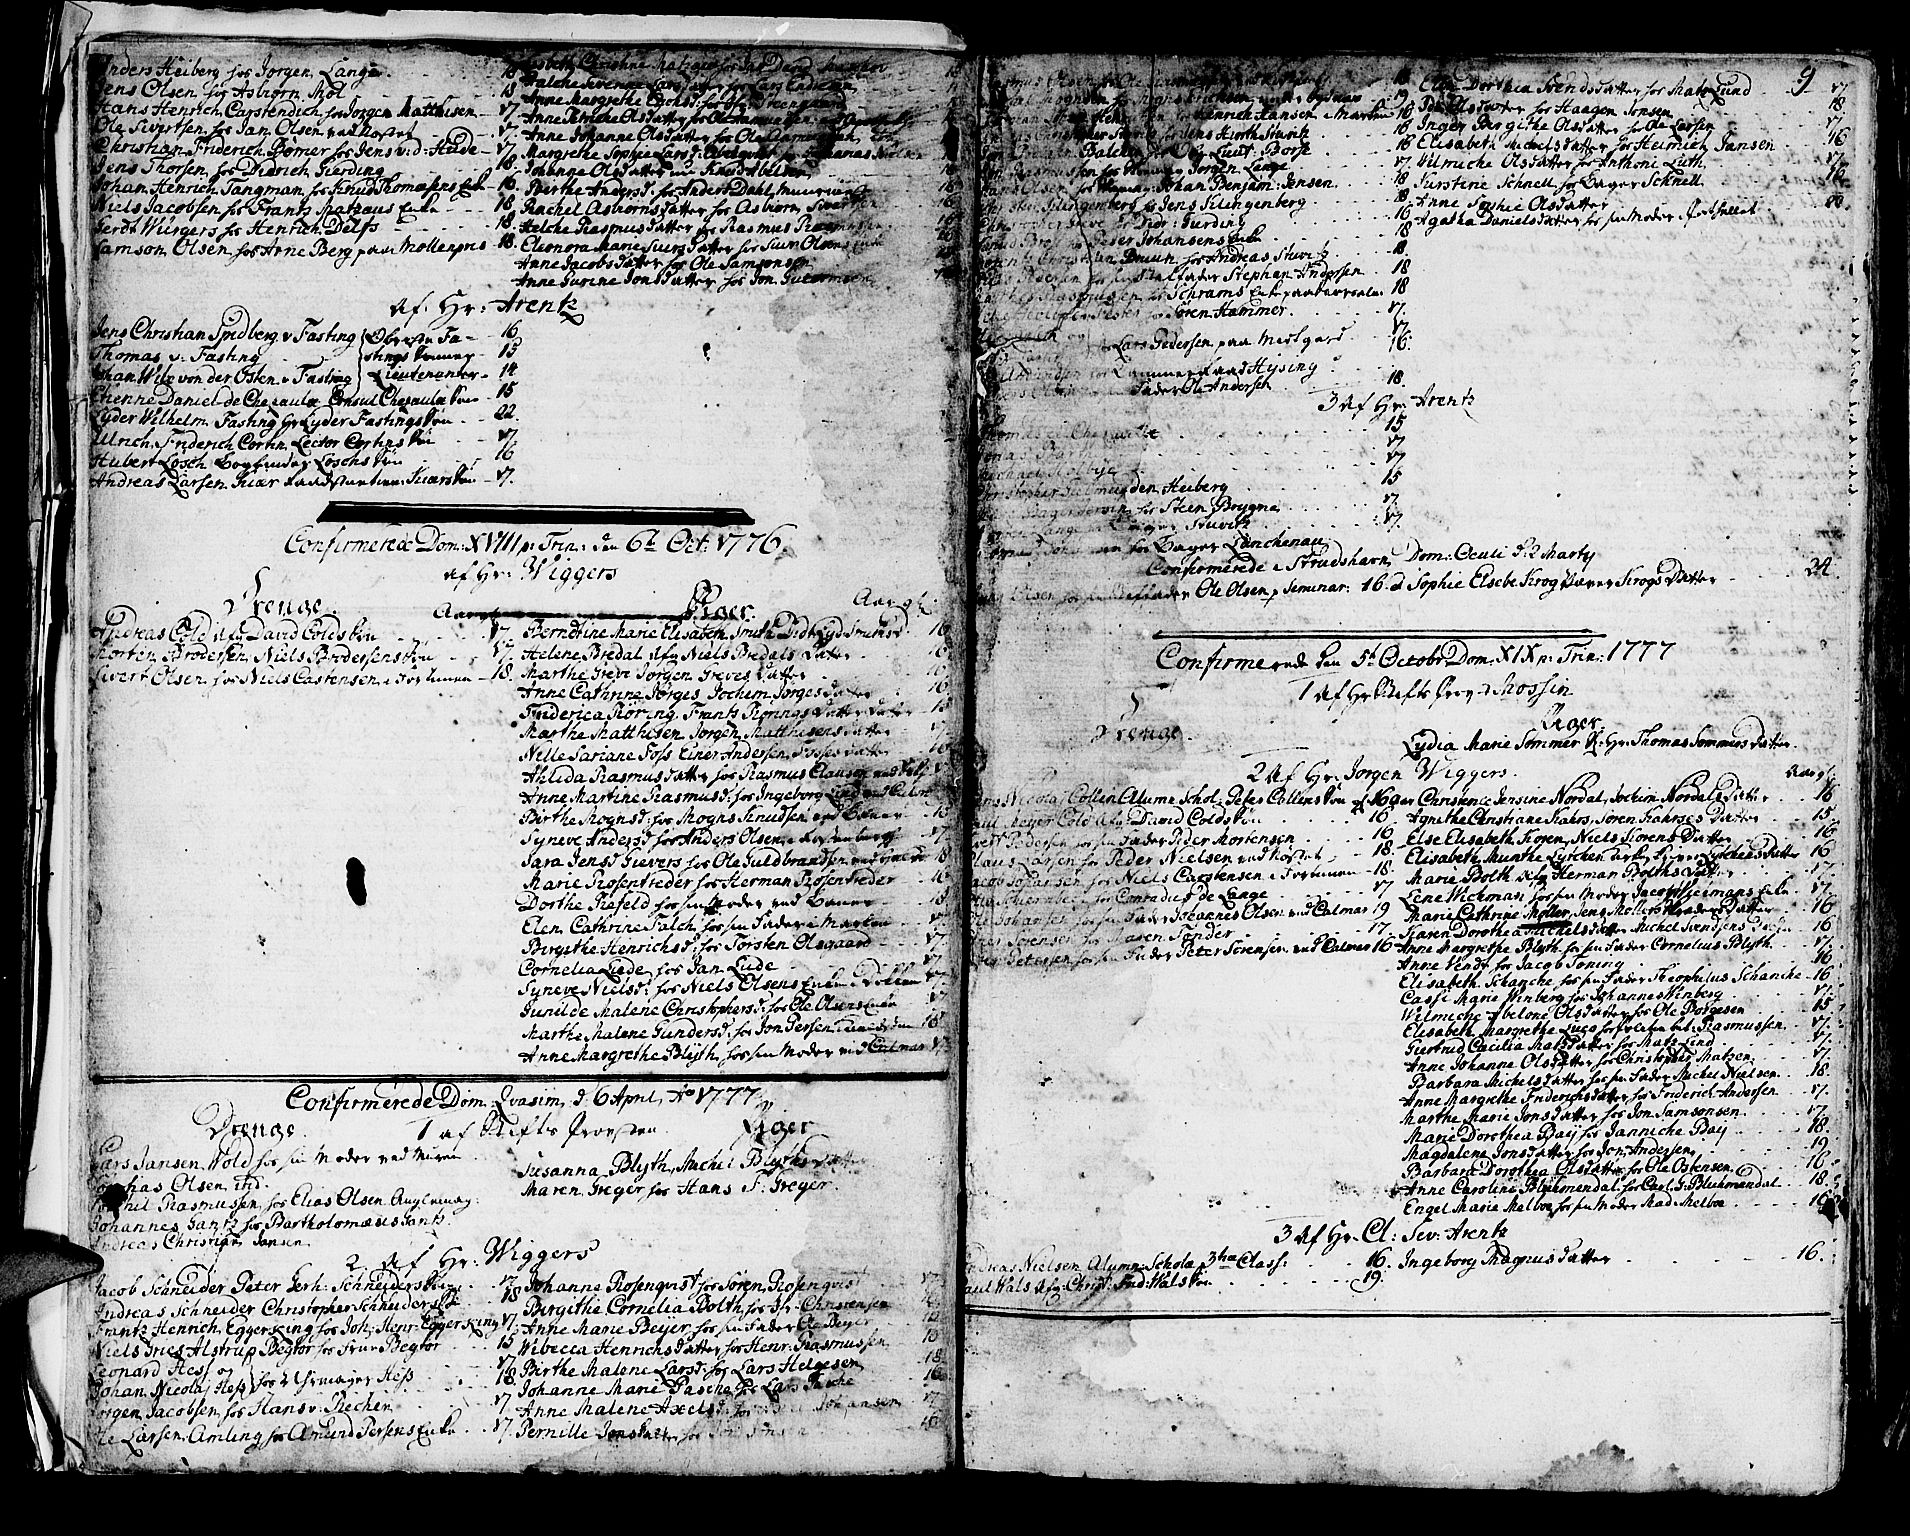 SAB, Domkirken sokneprestembete, H/Haa/L0004: Ministerialbok nr. A 4, 1763-1820, s. 9